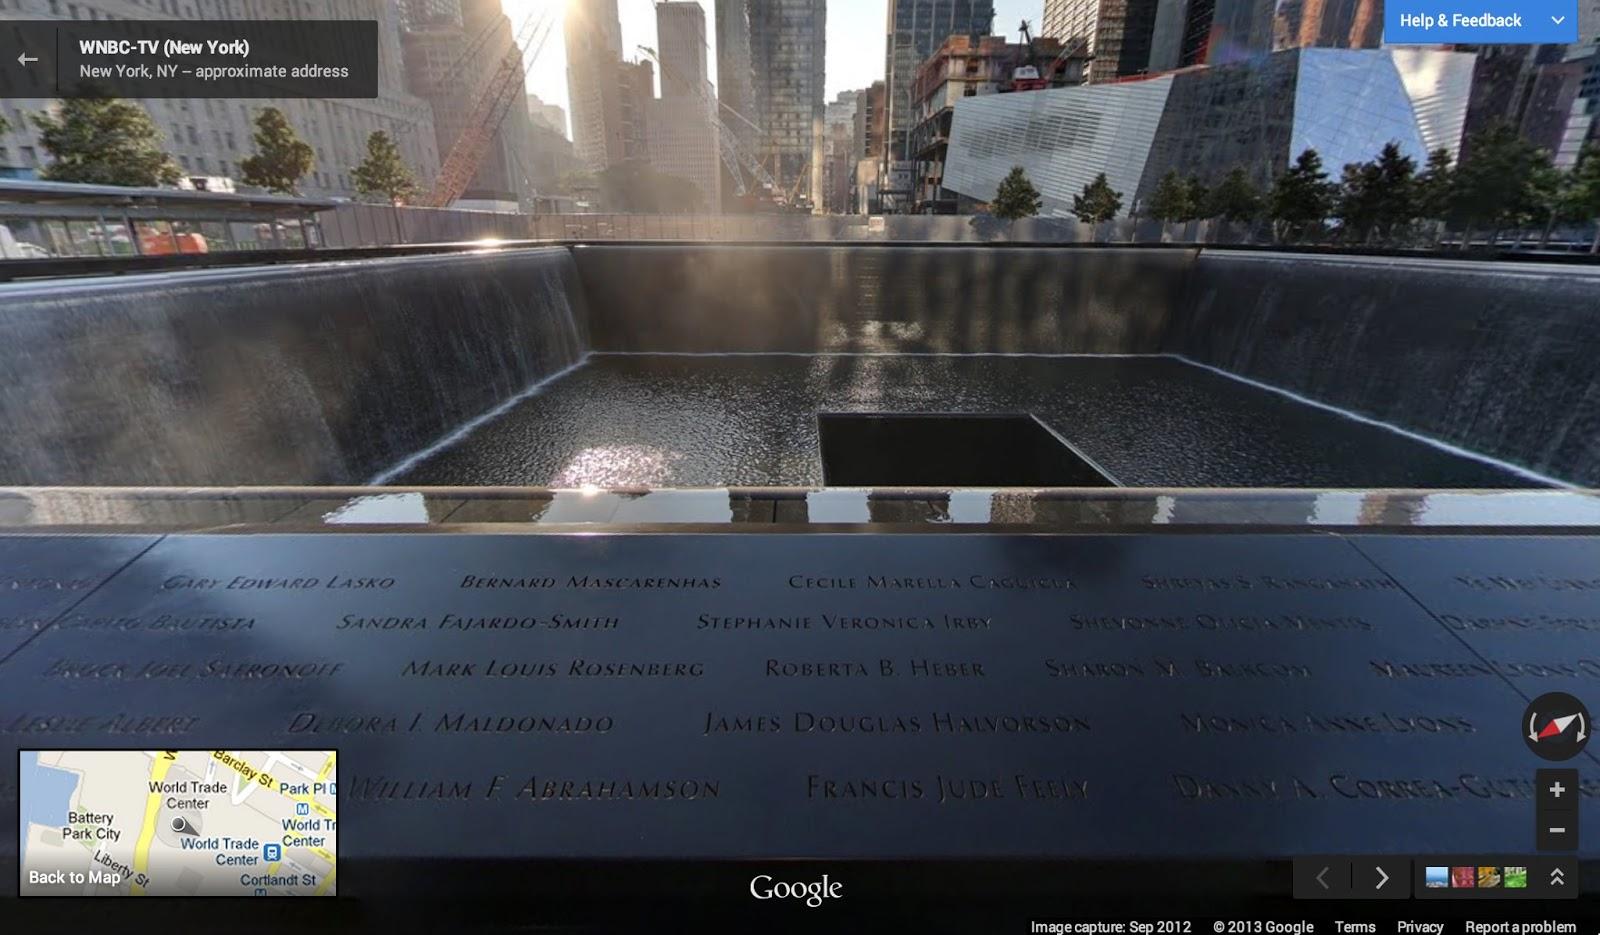 Google-Maps-9-11-Memorial-NYC